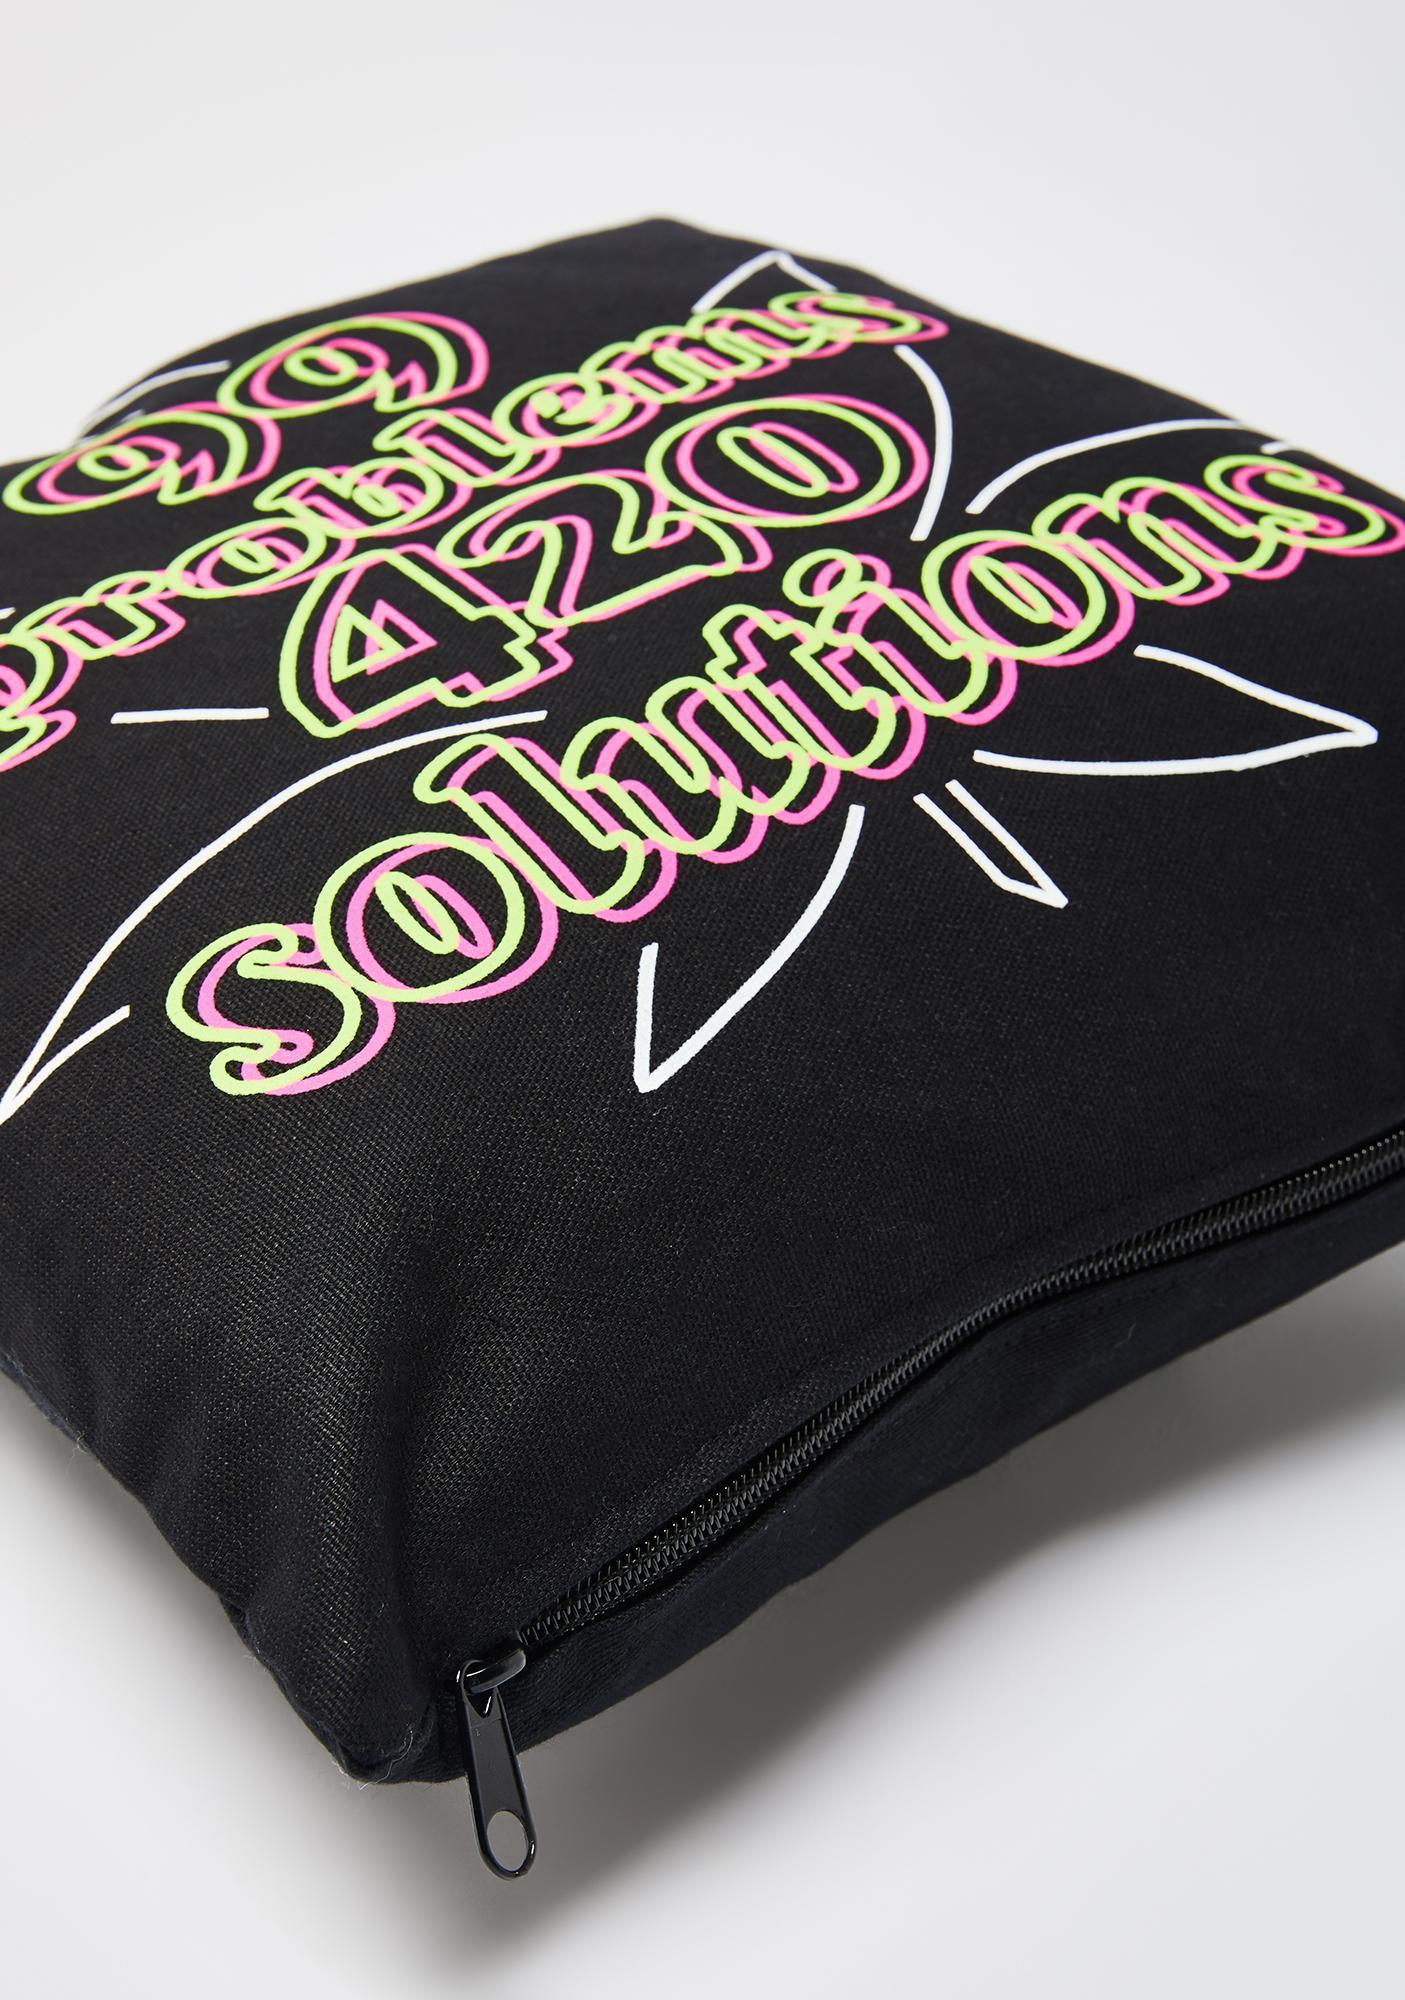 Femfetti 99 Problems Pillow